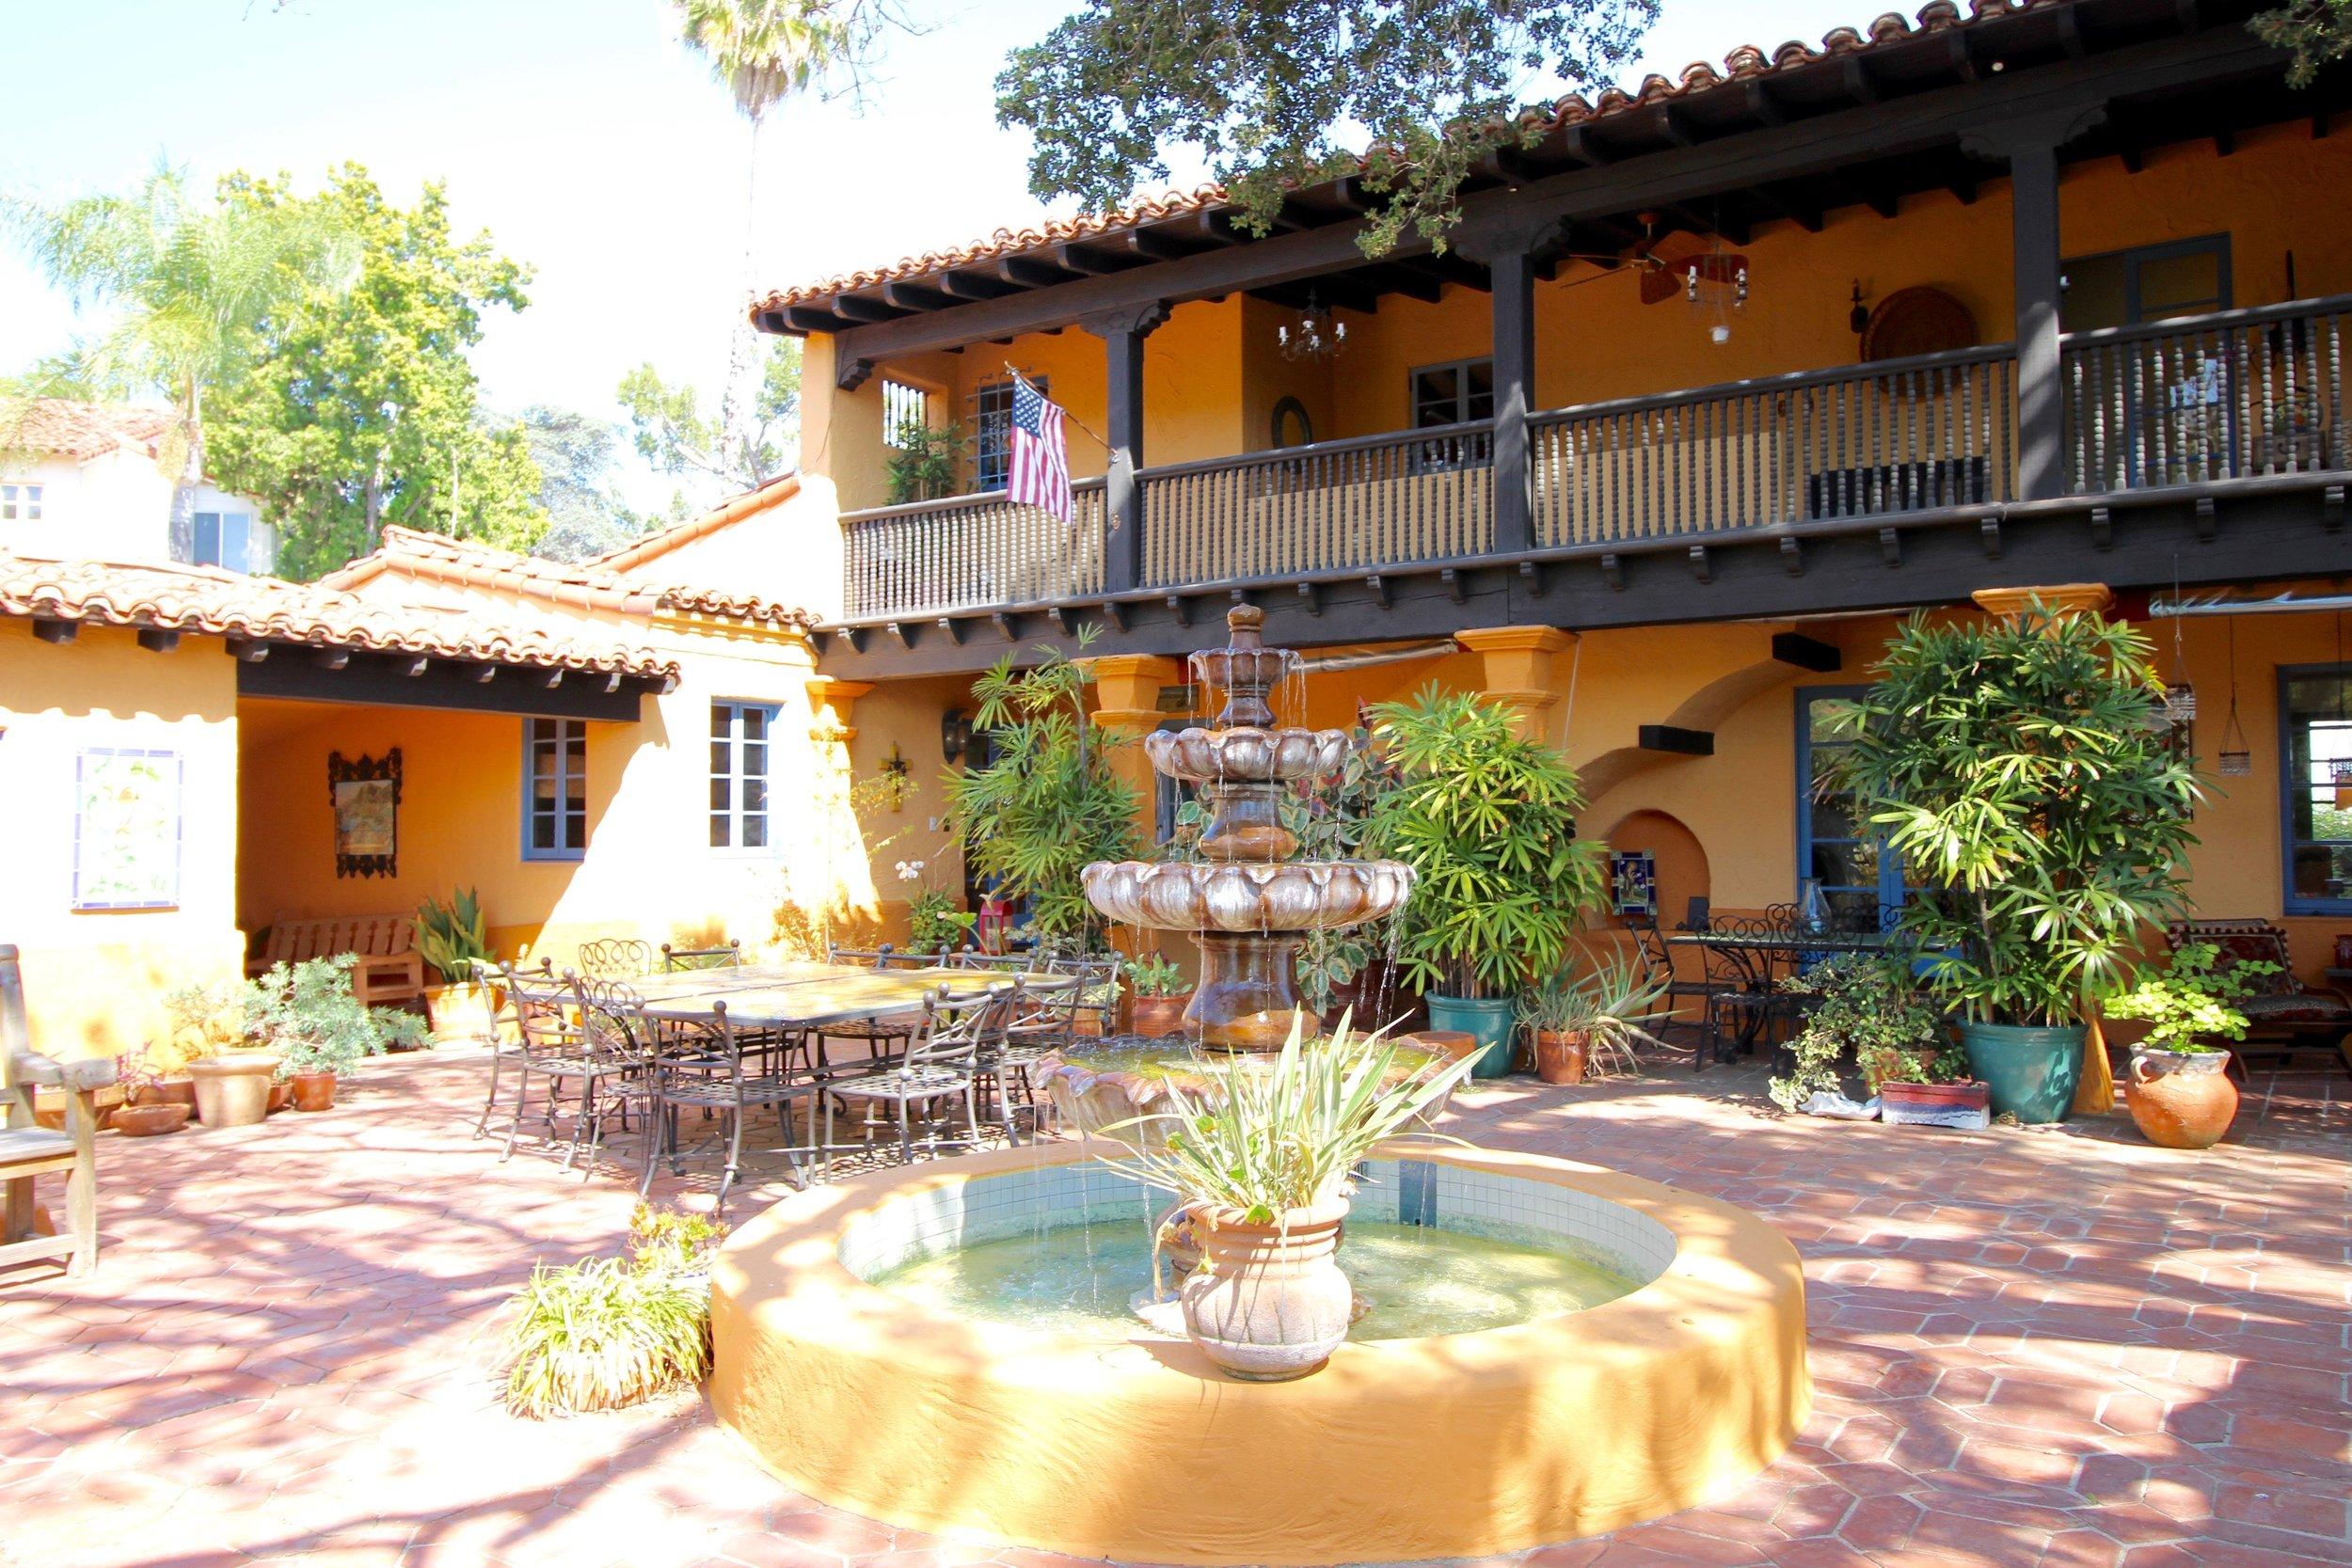 Funk House Courtyard.jpg